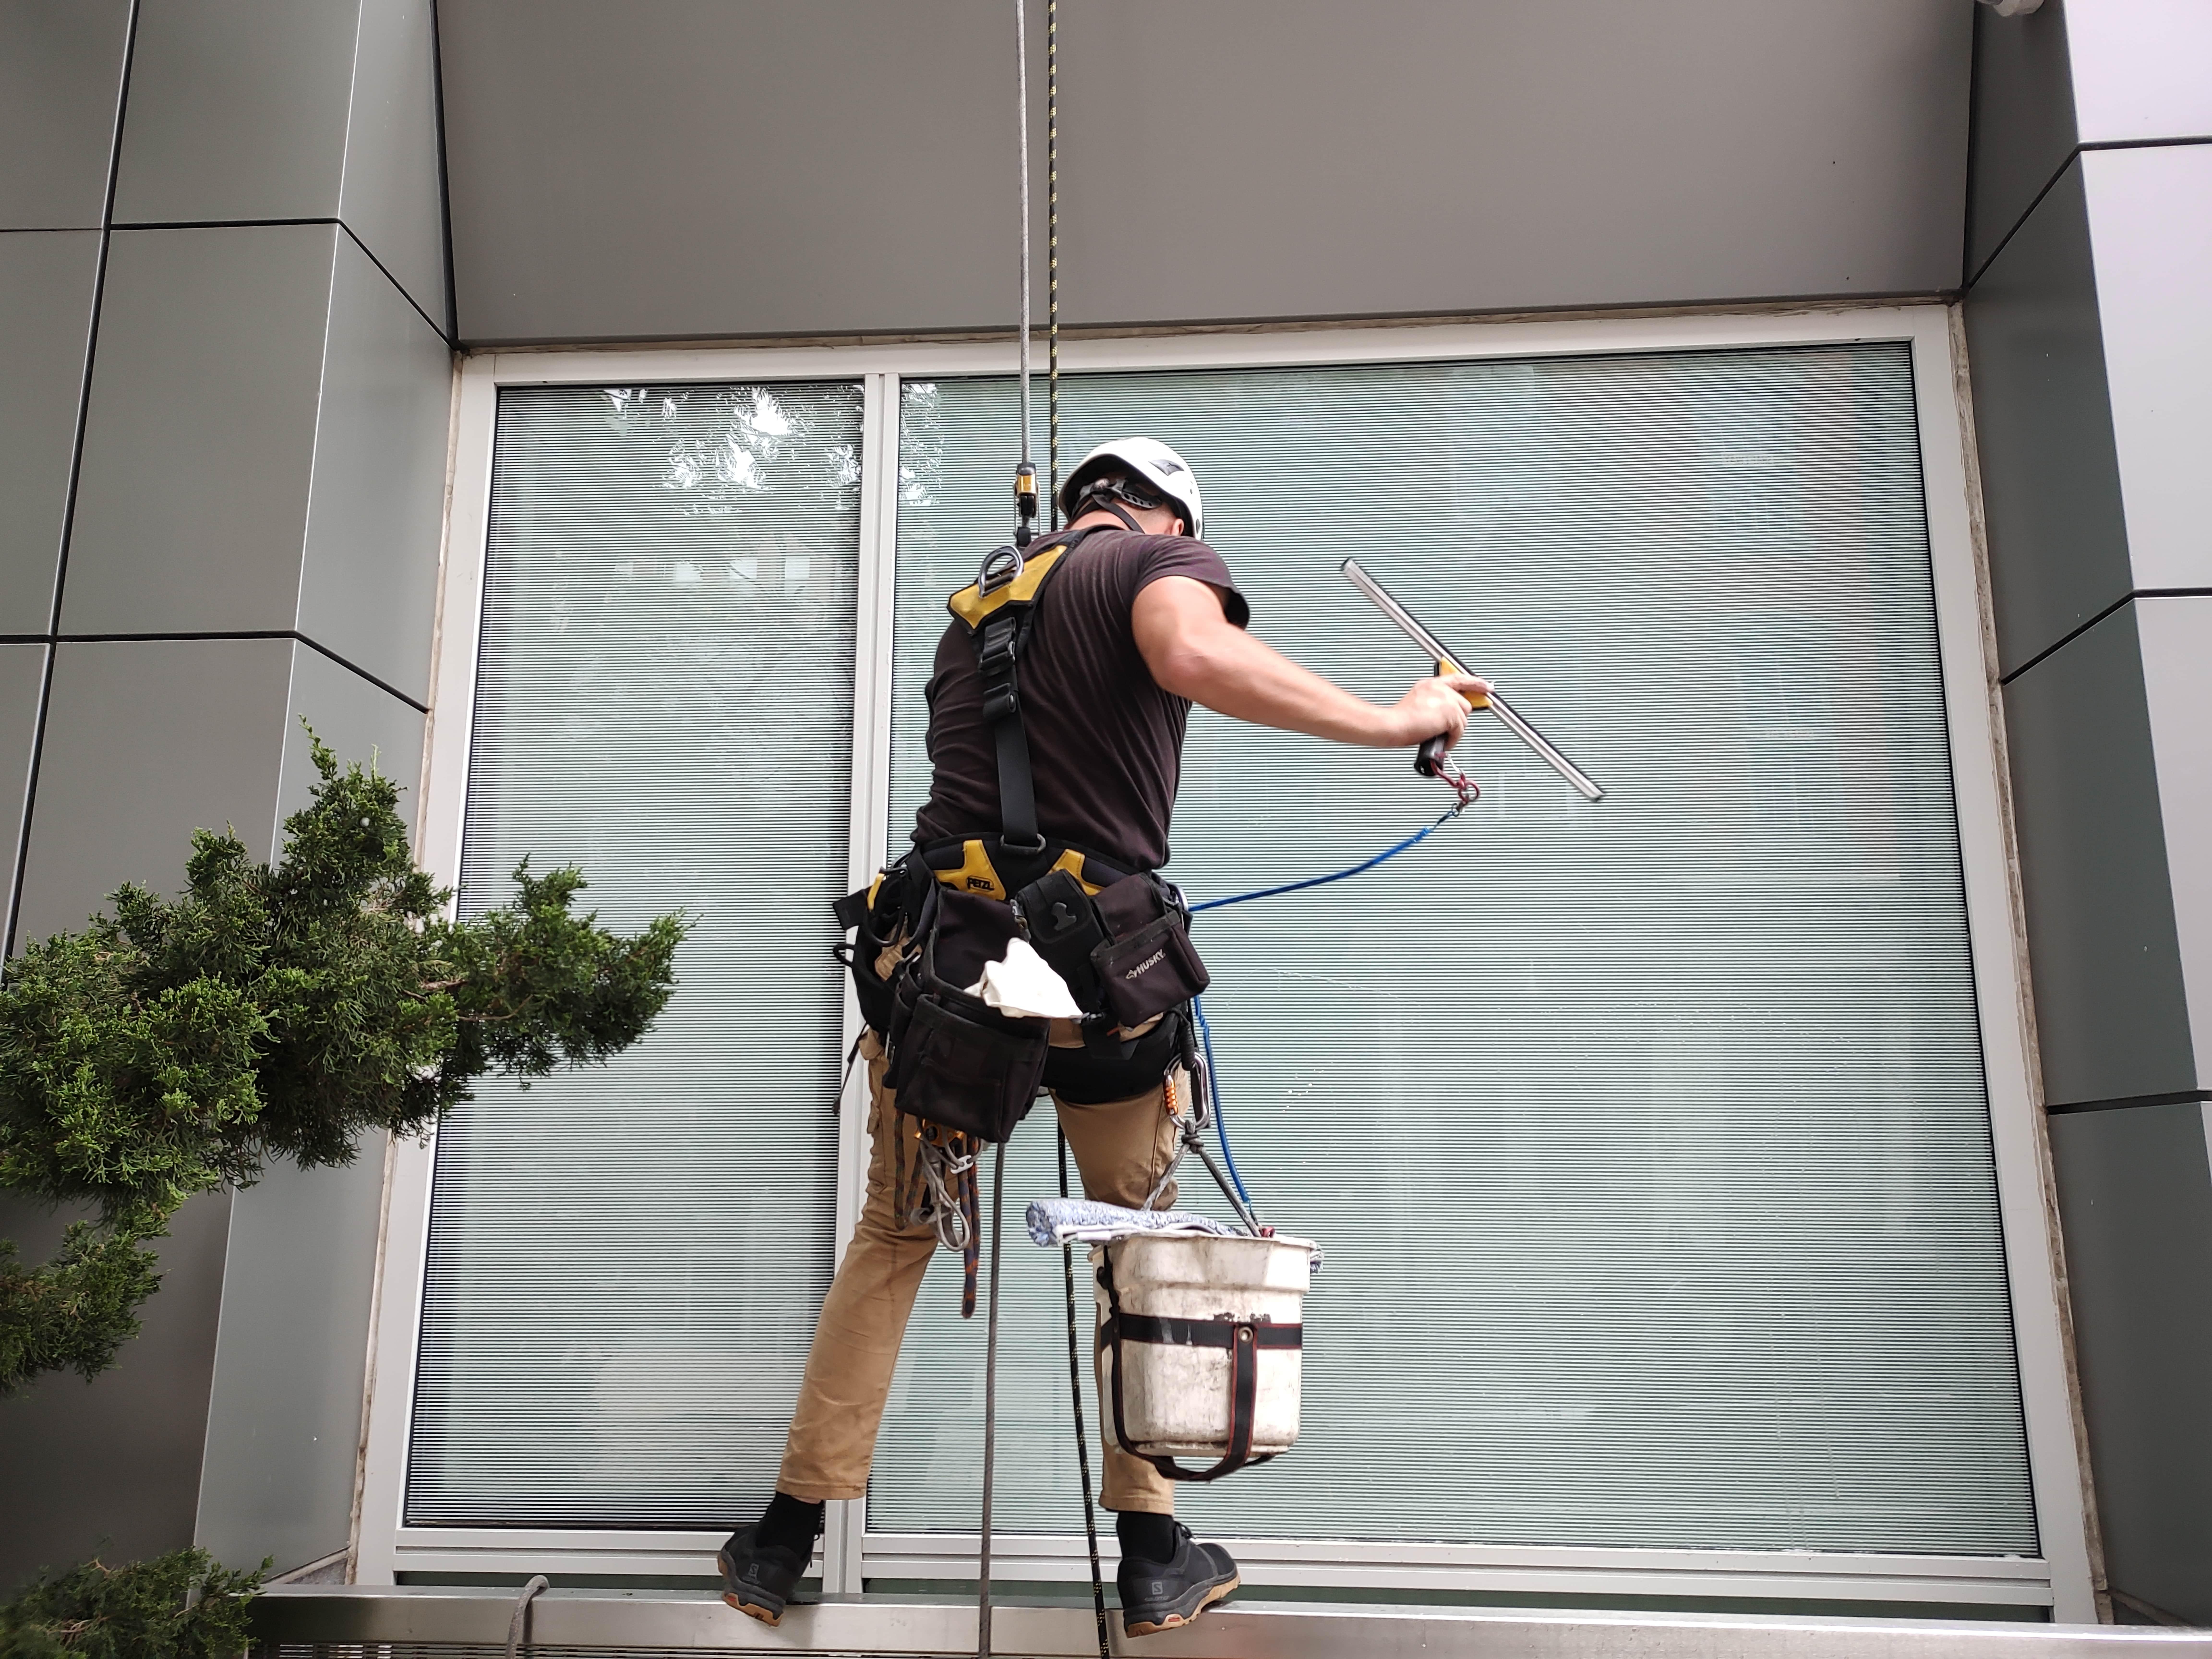 regular window washing services